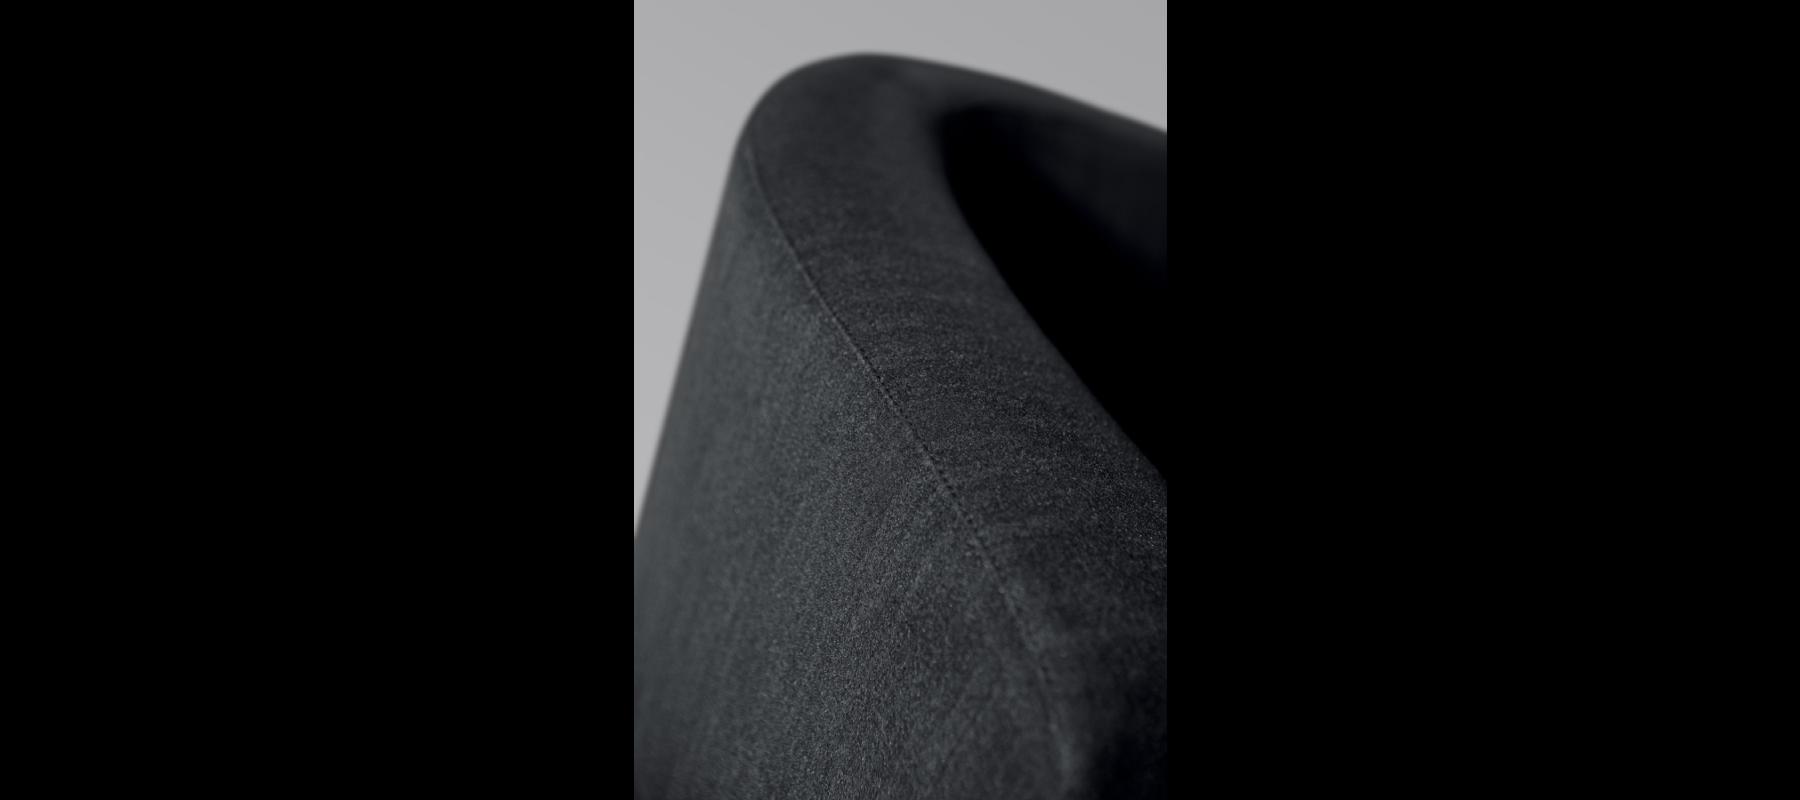 siedziska noble detale - 03